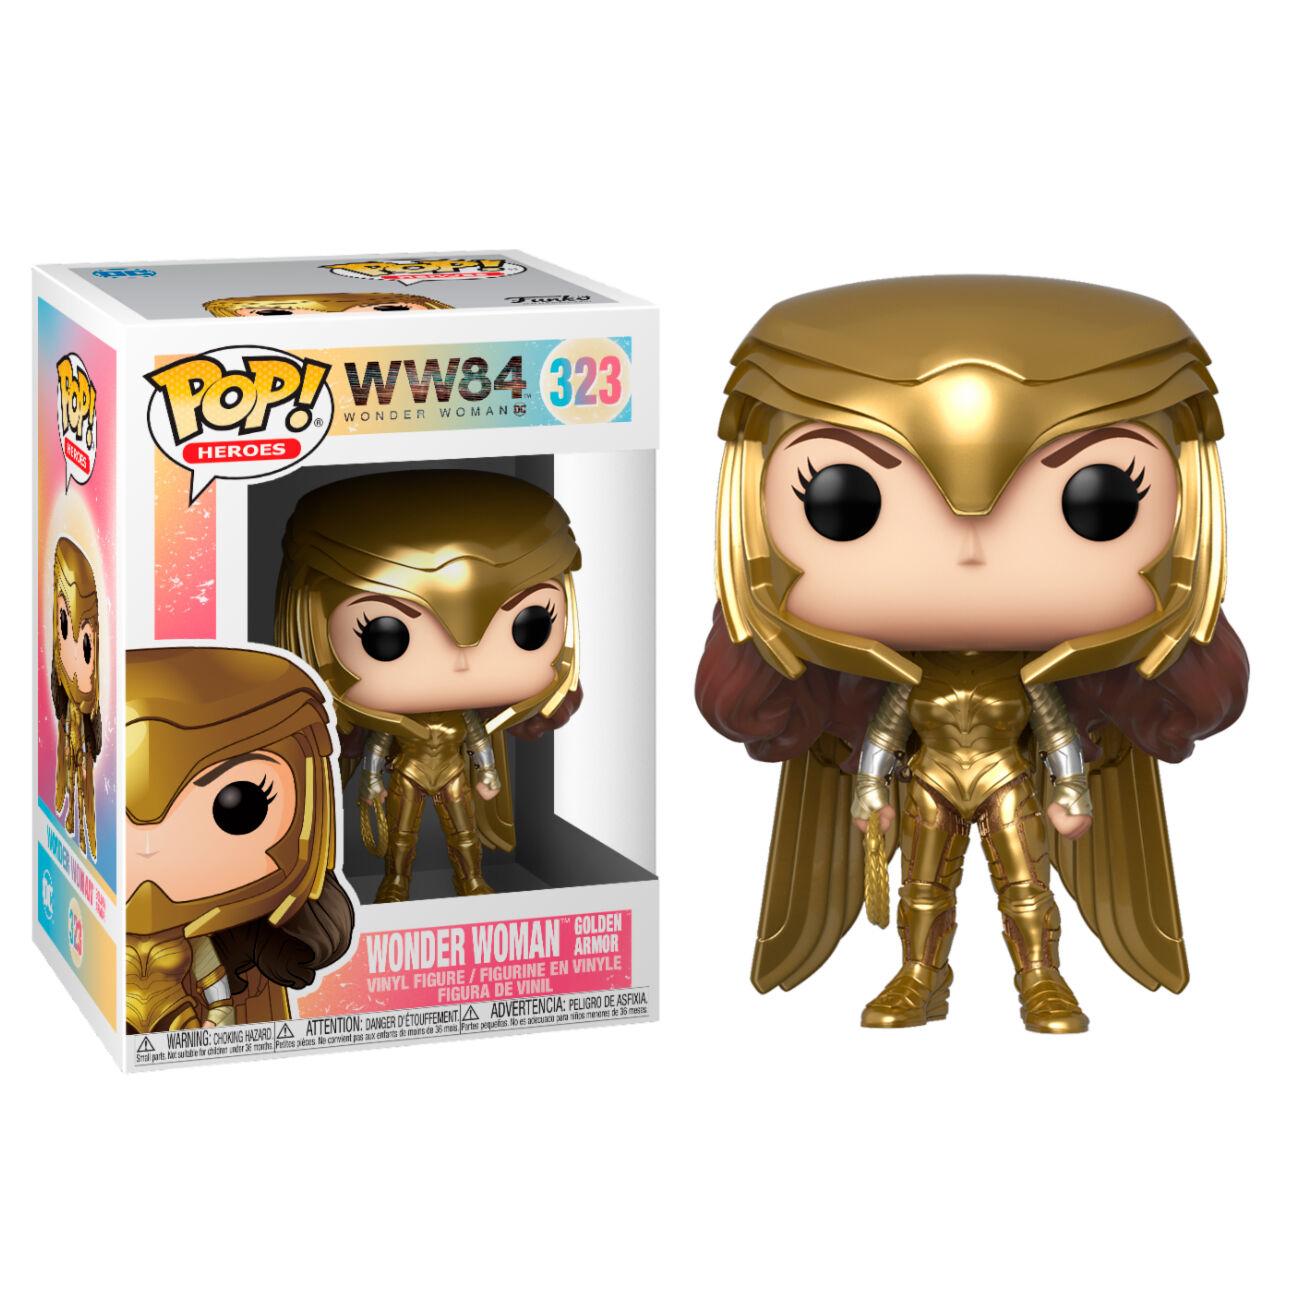 Figura POP DC Wonder Woman 1984 Wonder Woman Gold Power Pose